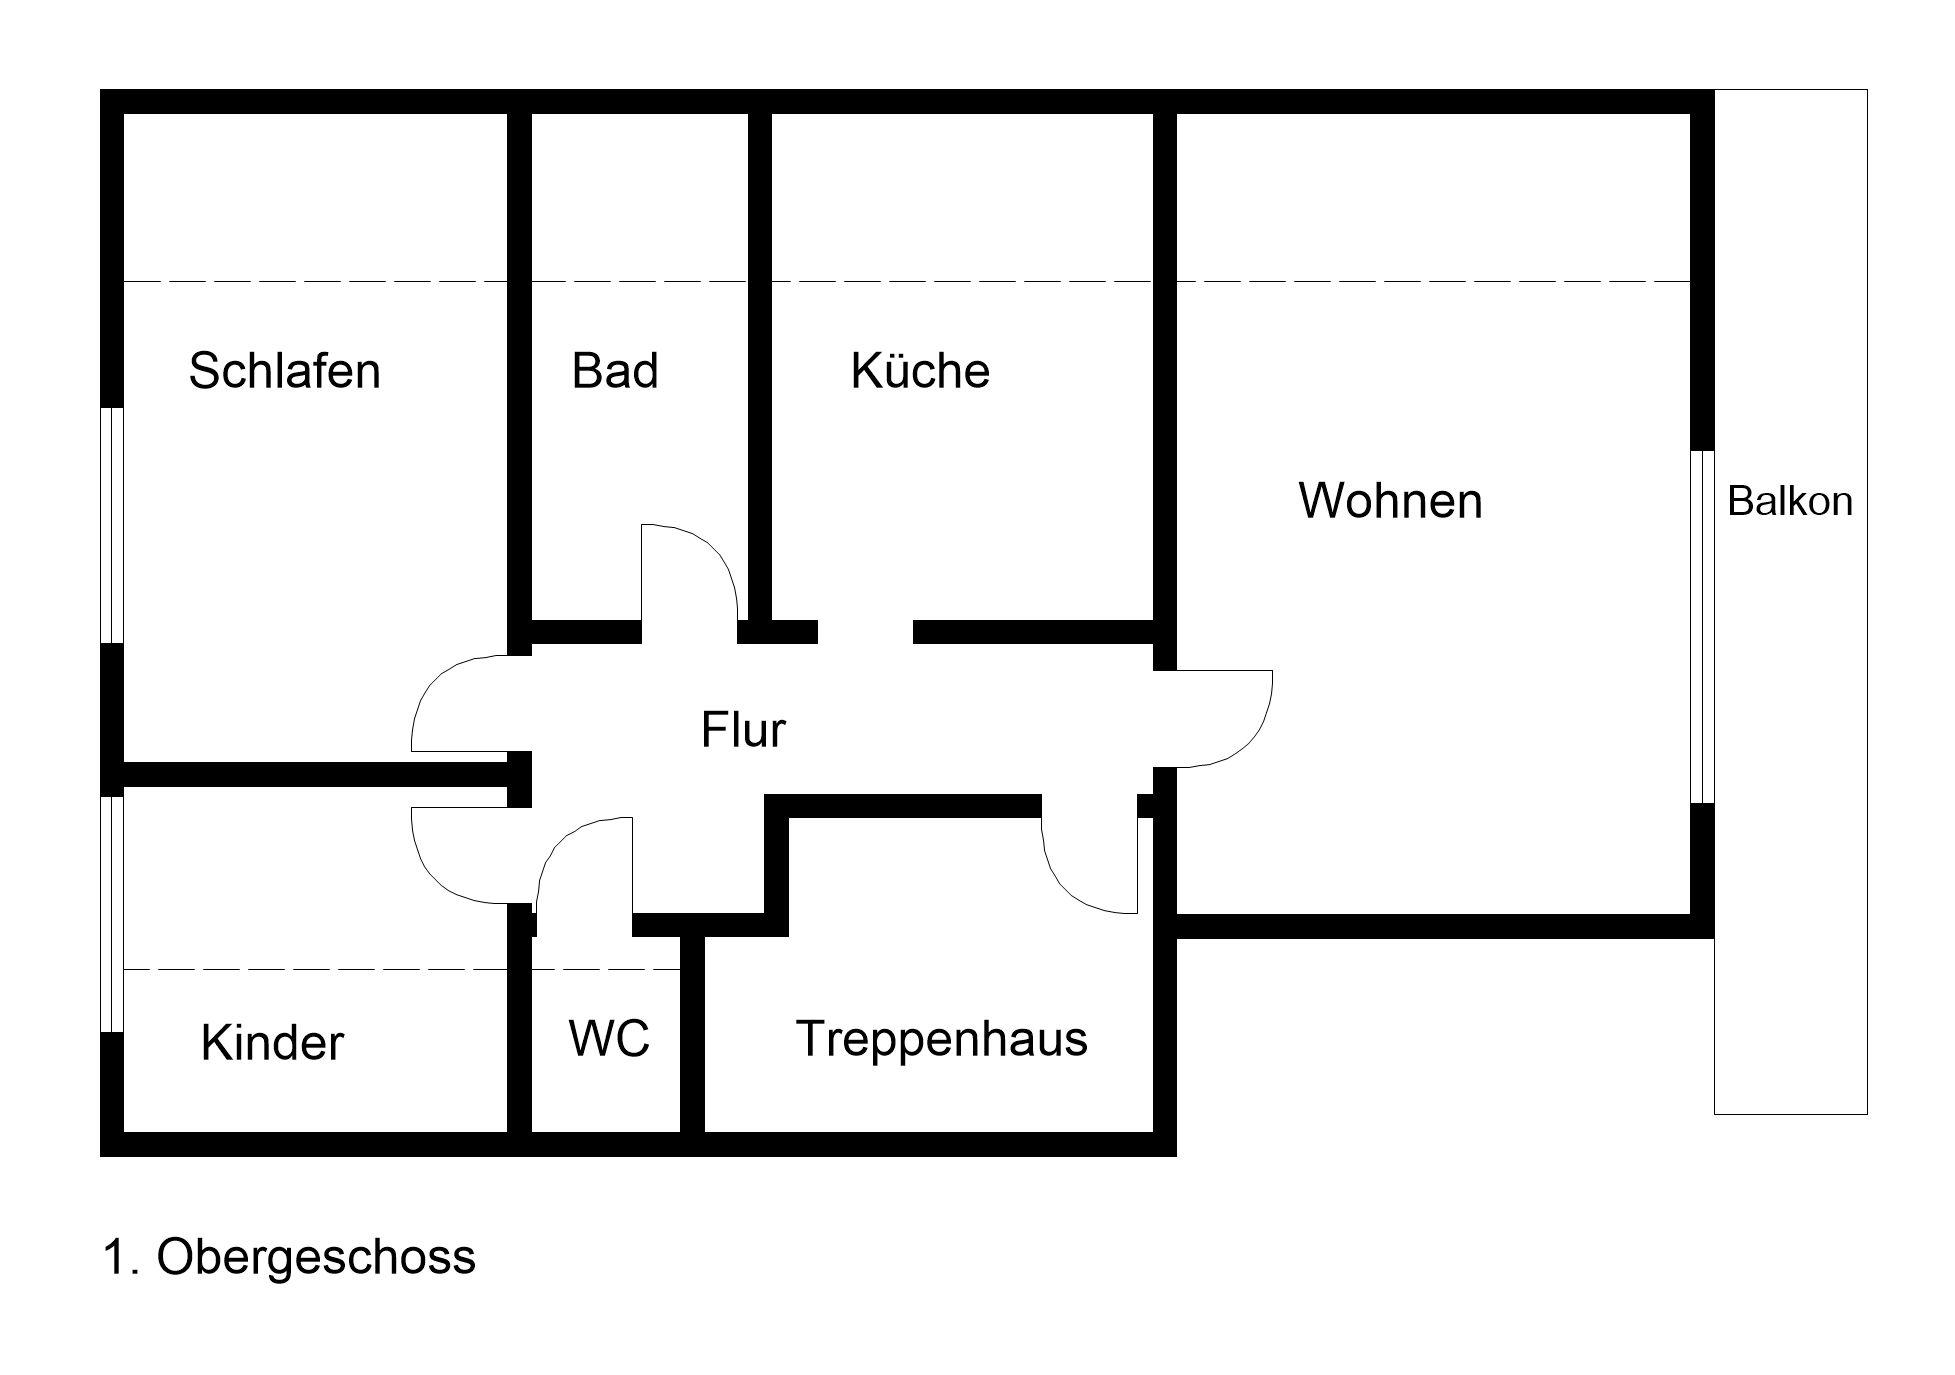 Ferienhaus gisela grundriss for Kinderzimmer 30 qm